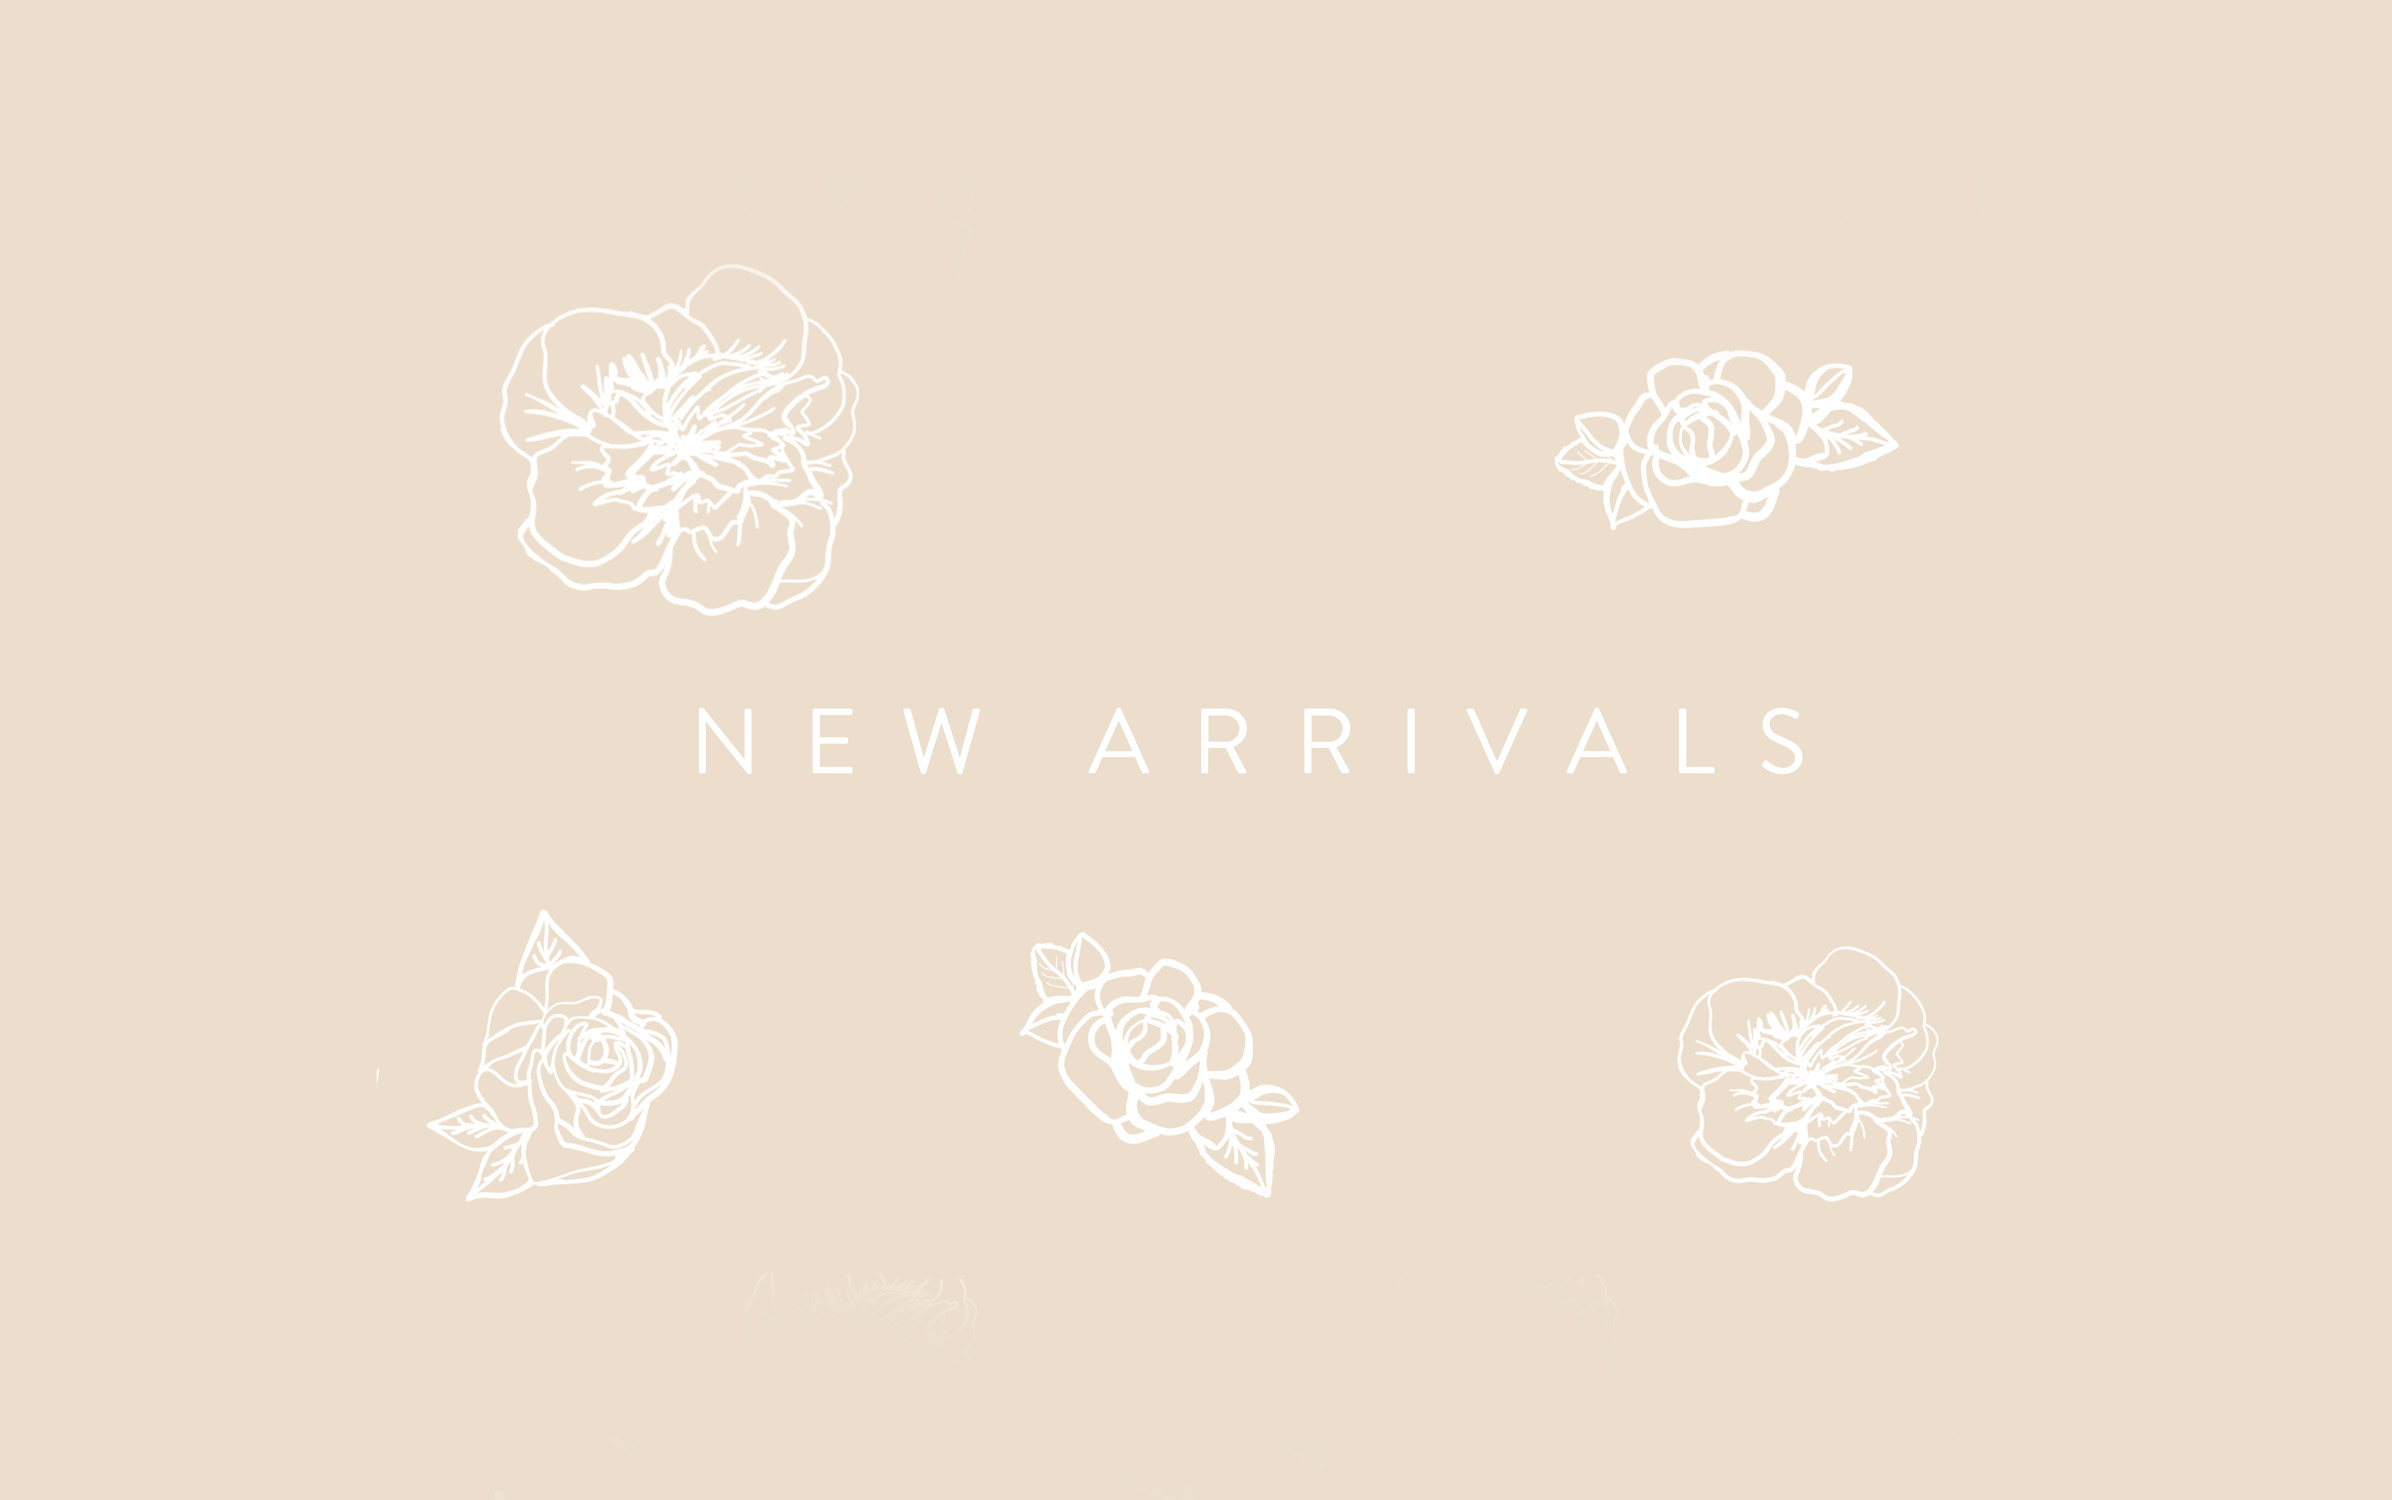 new arrivals banner edit10.jpg